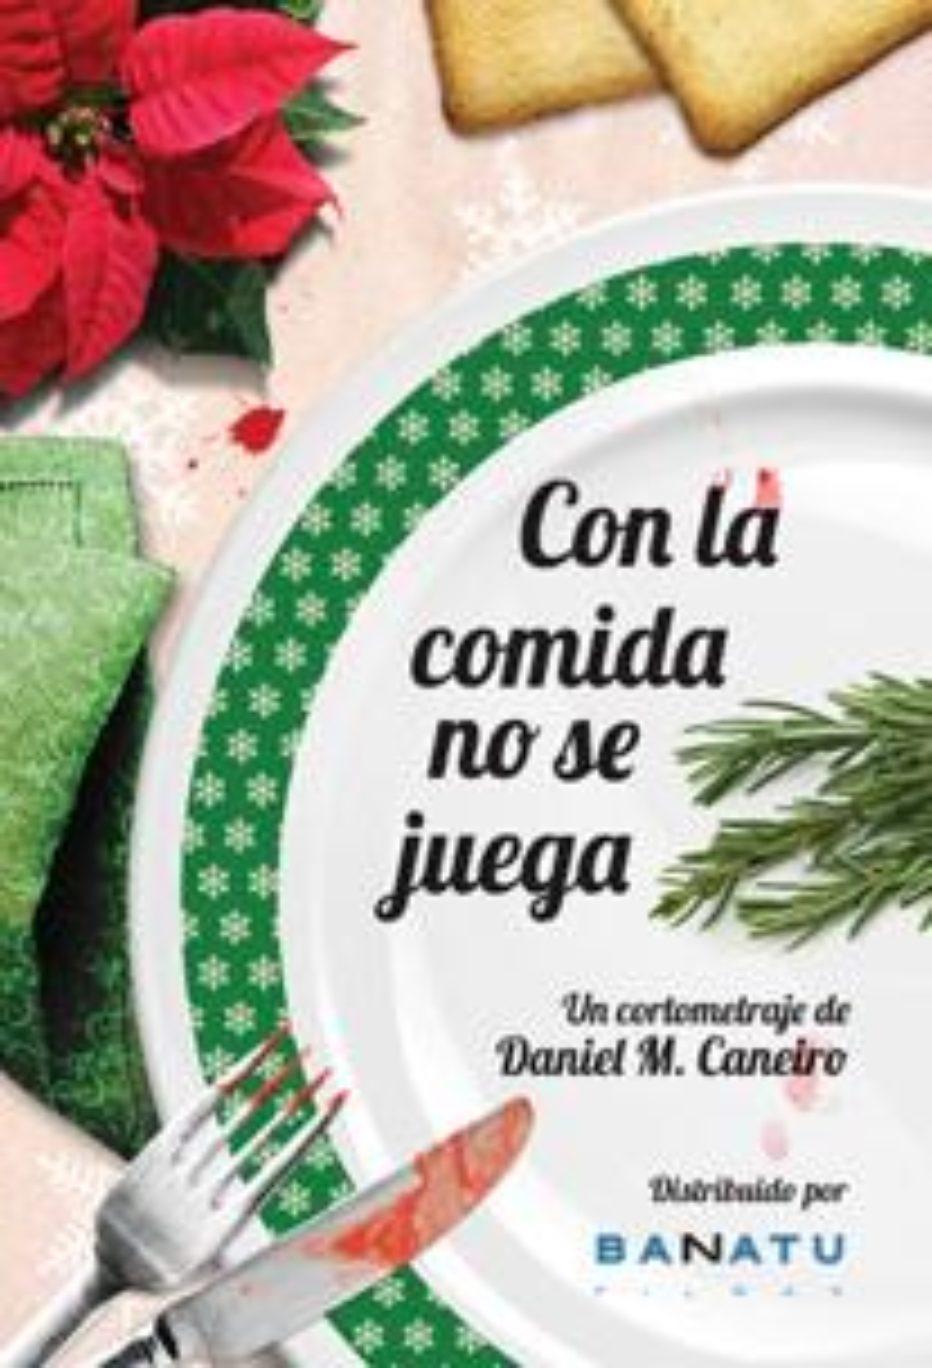 Daniel M. Caneiro pone rumbo a EEUU para rodar su primer largometraje